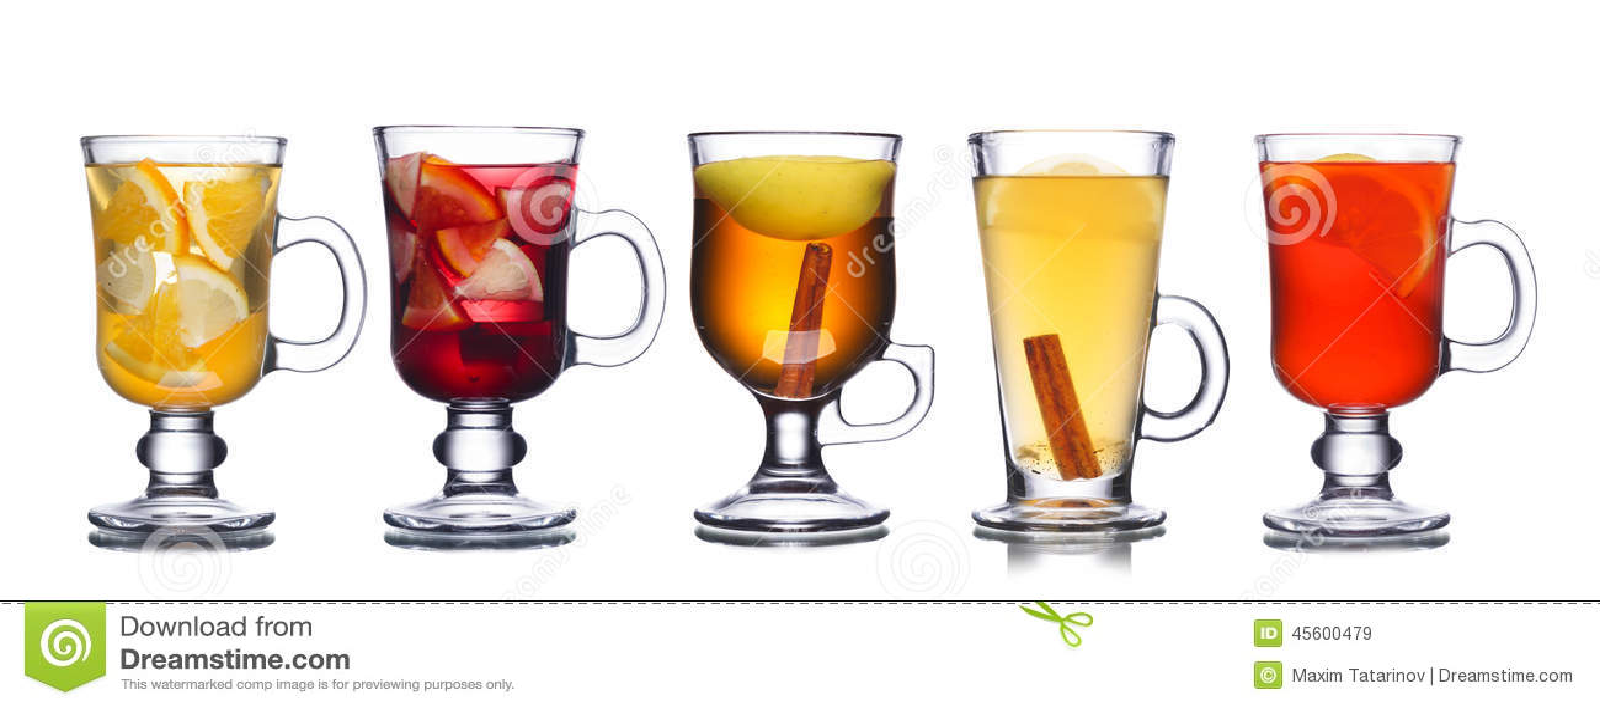 Christmas Beverages Stock Photo - Image: 45600479